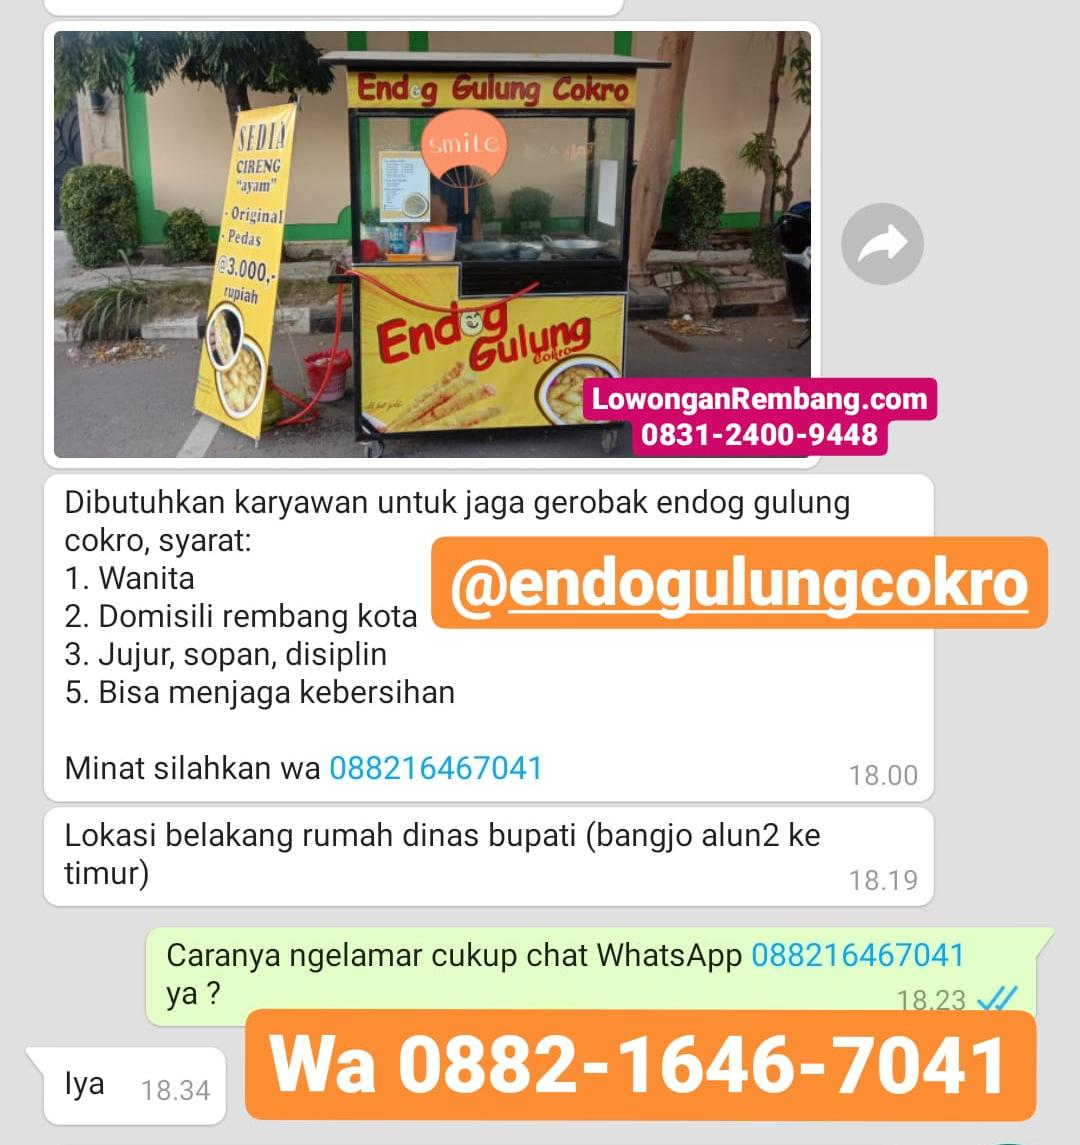 Lowongan Kerja Endog Gulung Rembang Tanpa Syarat Pendidikan, Batas Umur, Tanpa Berkas Lamaran Kerja Cukup Chat WhatsApp